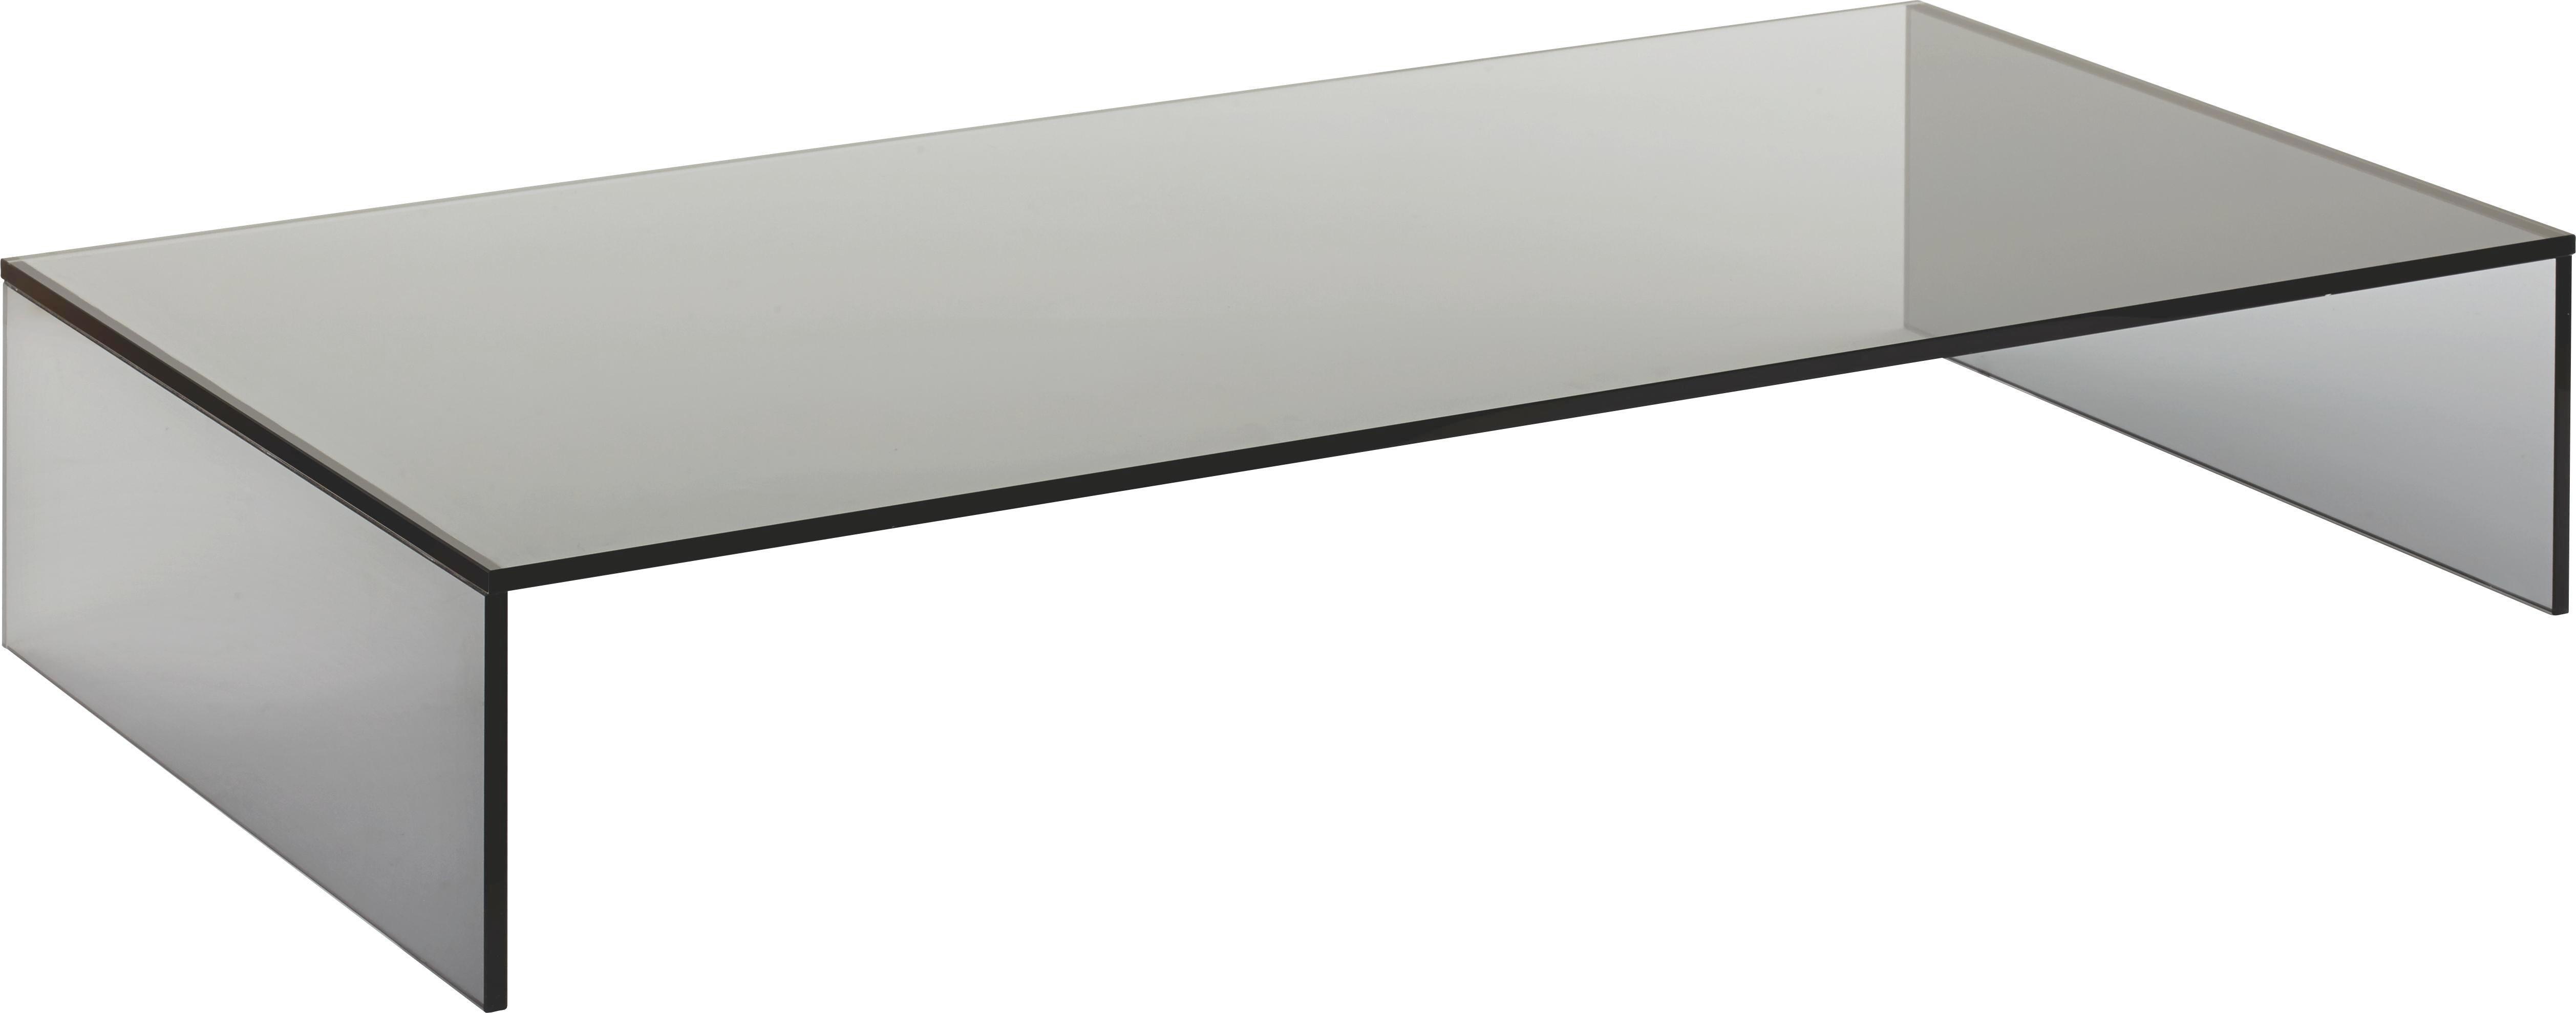 TV-Aufsatz Glas - Dunkelgrau, Glas (80/14/40cm) - MÖMAX modern living